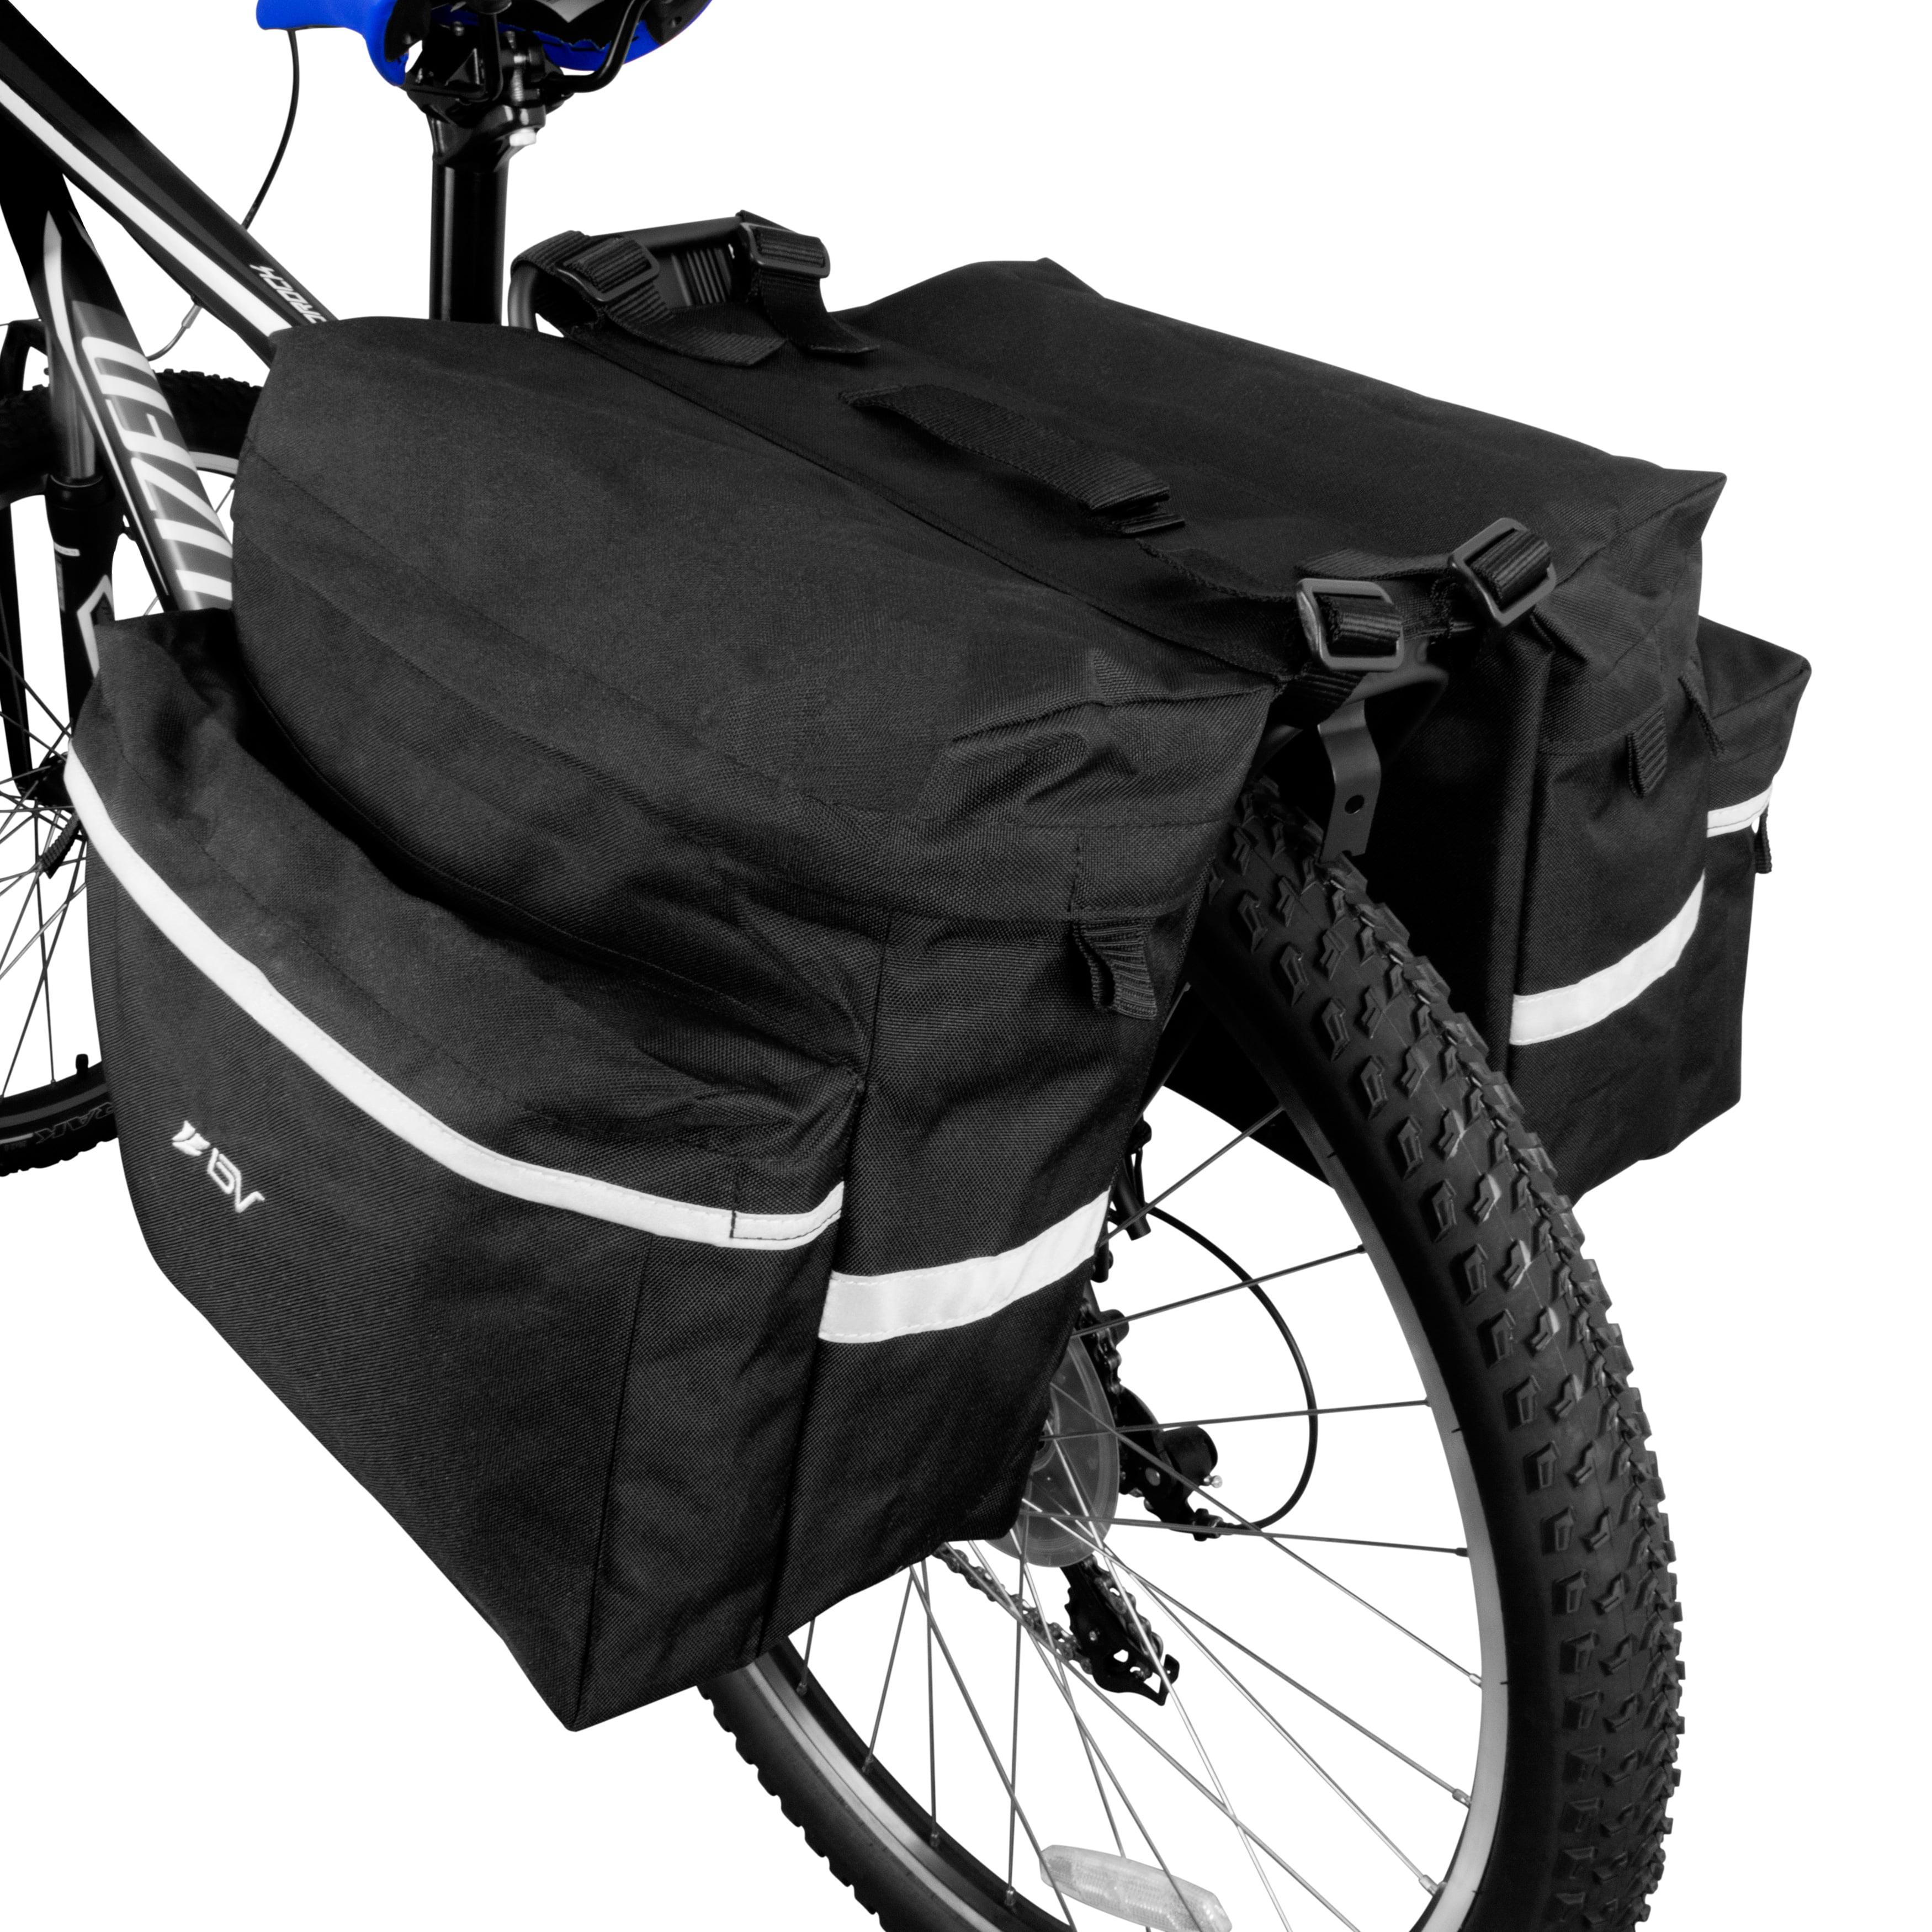 Carrying Handle Bike Bag Bicycle Panniers w// Adjustable Hooks Reflective Trim